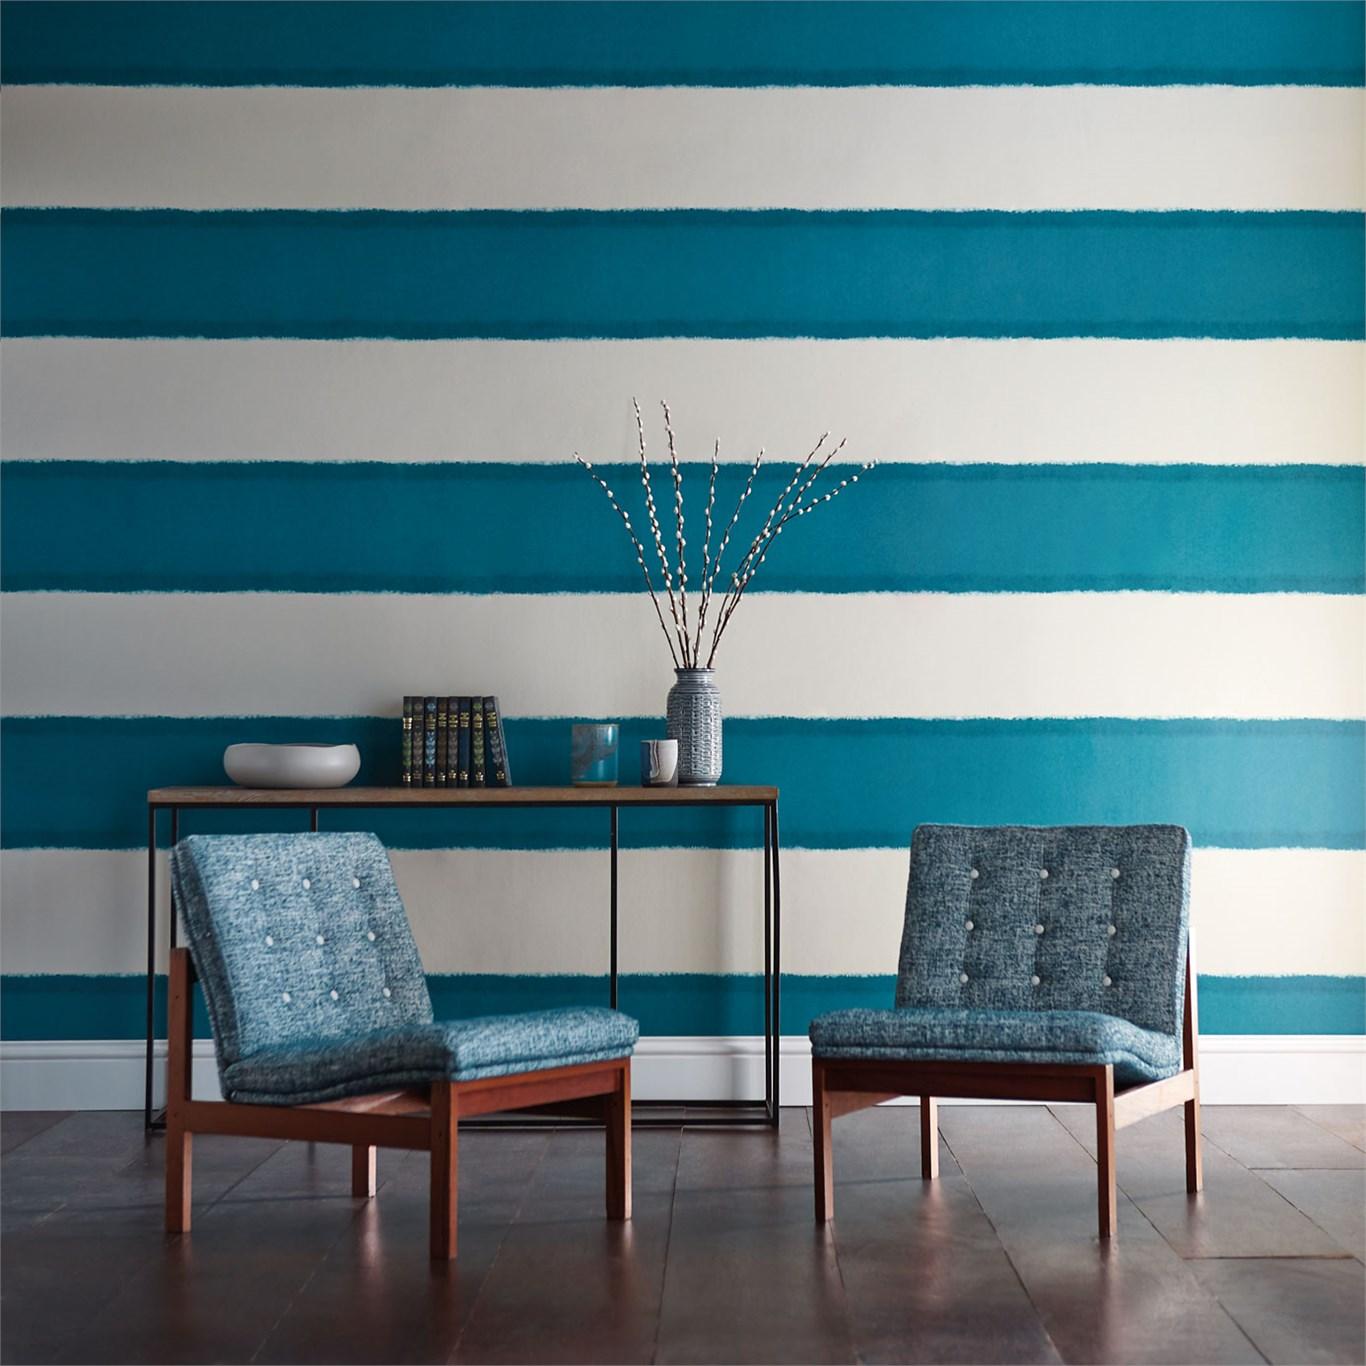 Decorando con rayas horizontales villalba interiorismo - Papel de pared de rayas ...